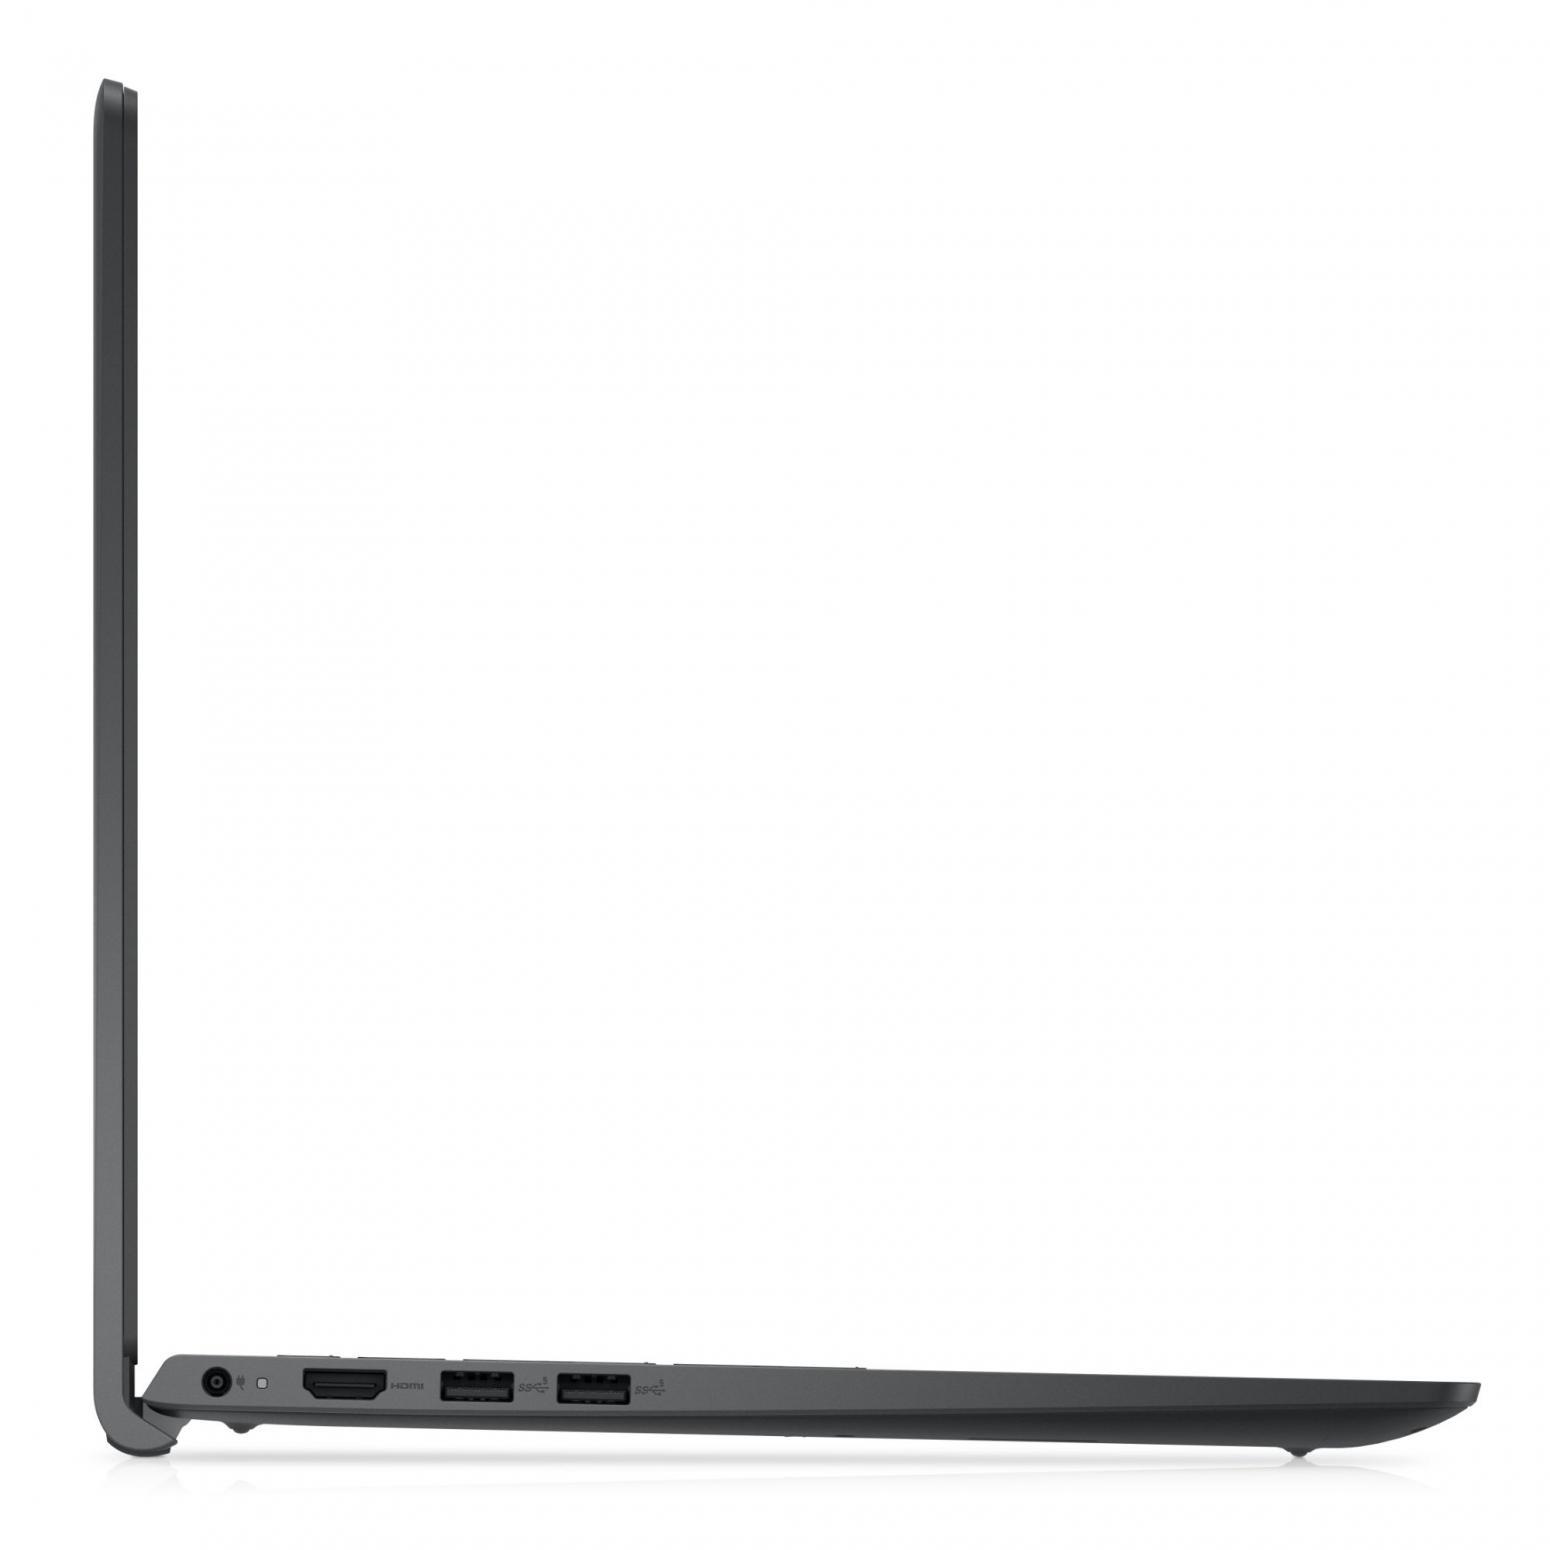 Ordinateur portable Dell Inspiron 15 3511 Noir - i3, Intel G4, SSD 256 Go - photo 4